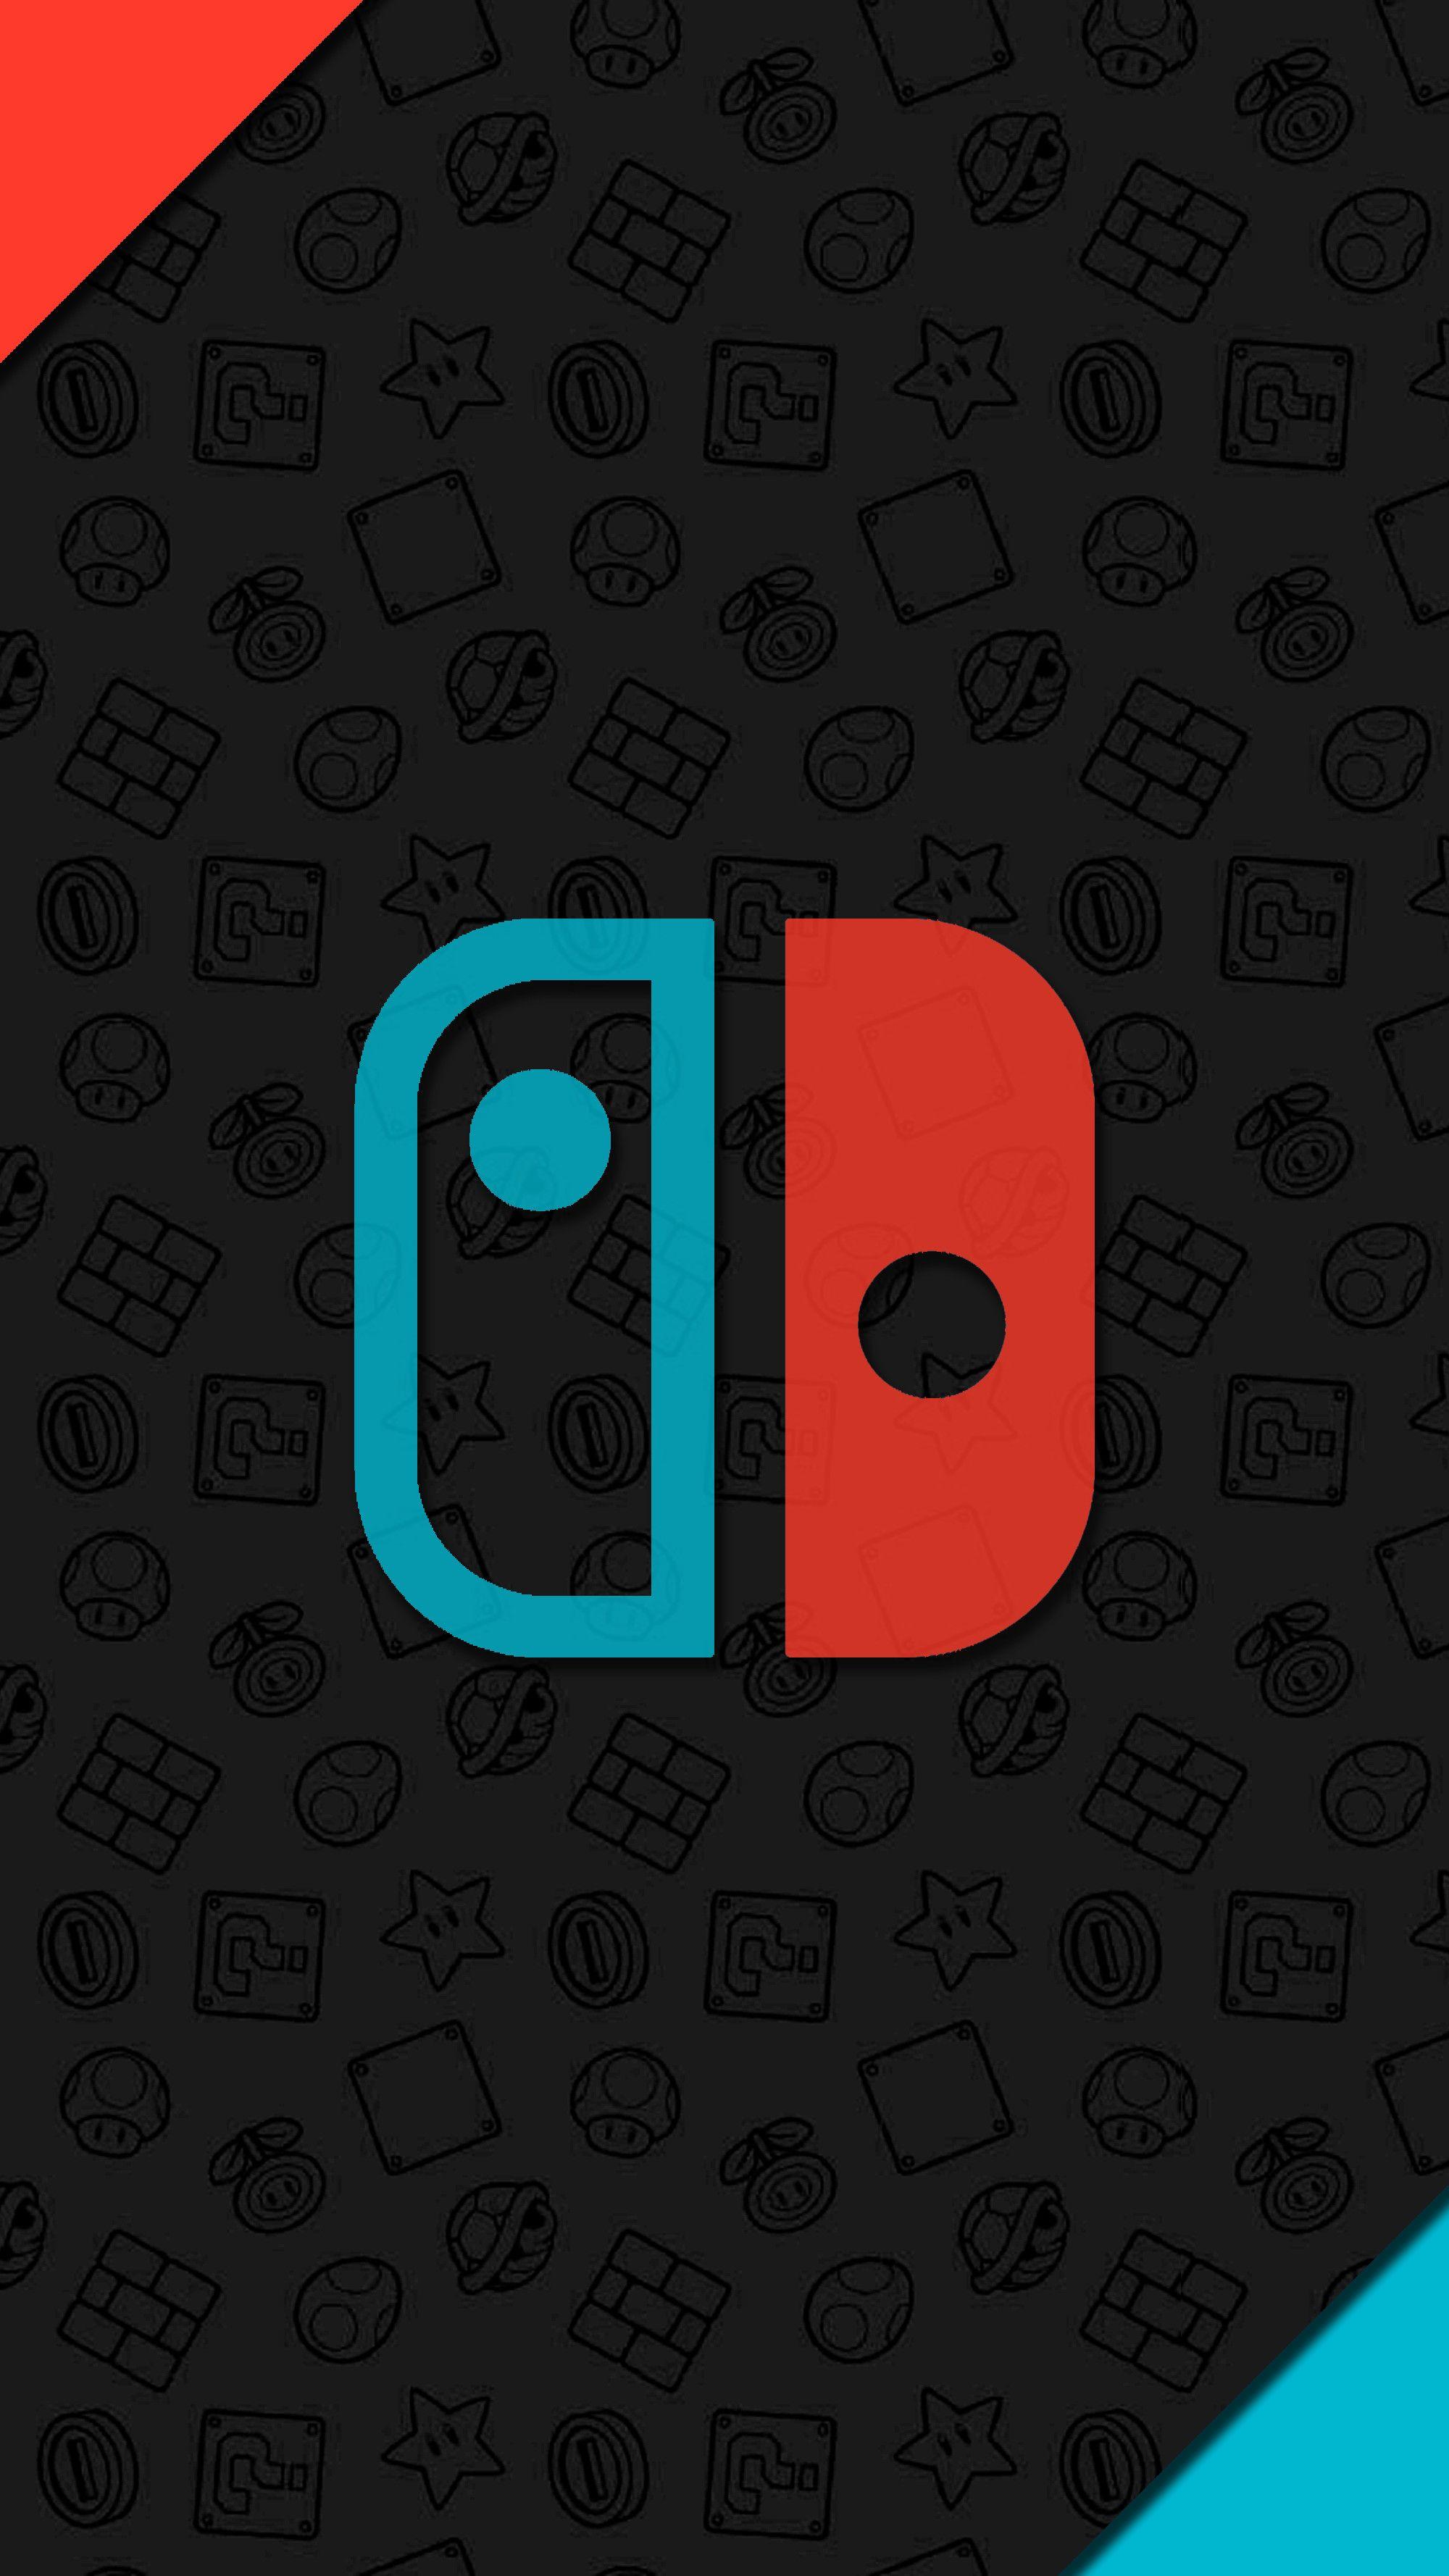 Nintendo Phone Wallpapers   Top Nintendo Phone Backgrounds 2000x3556